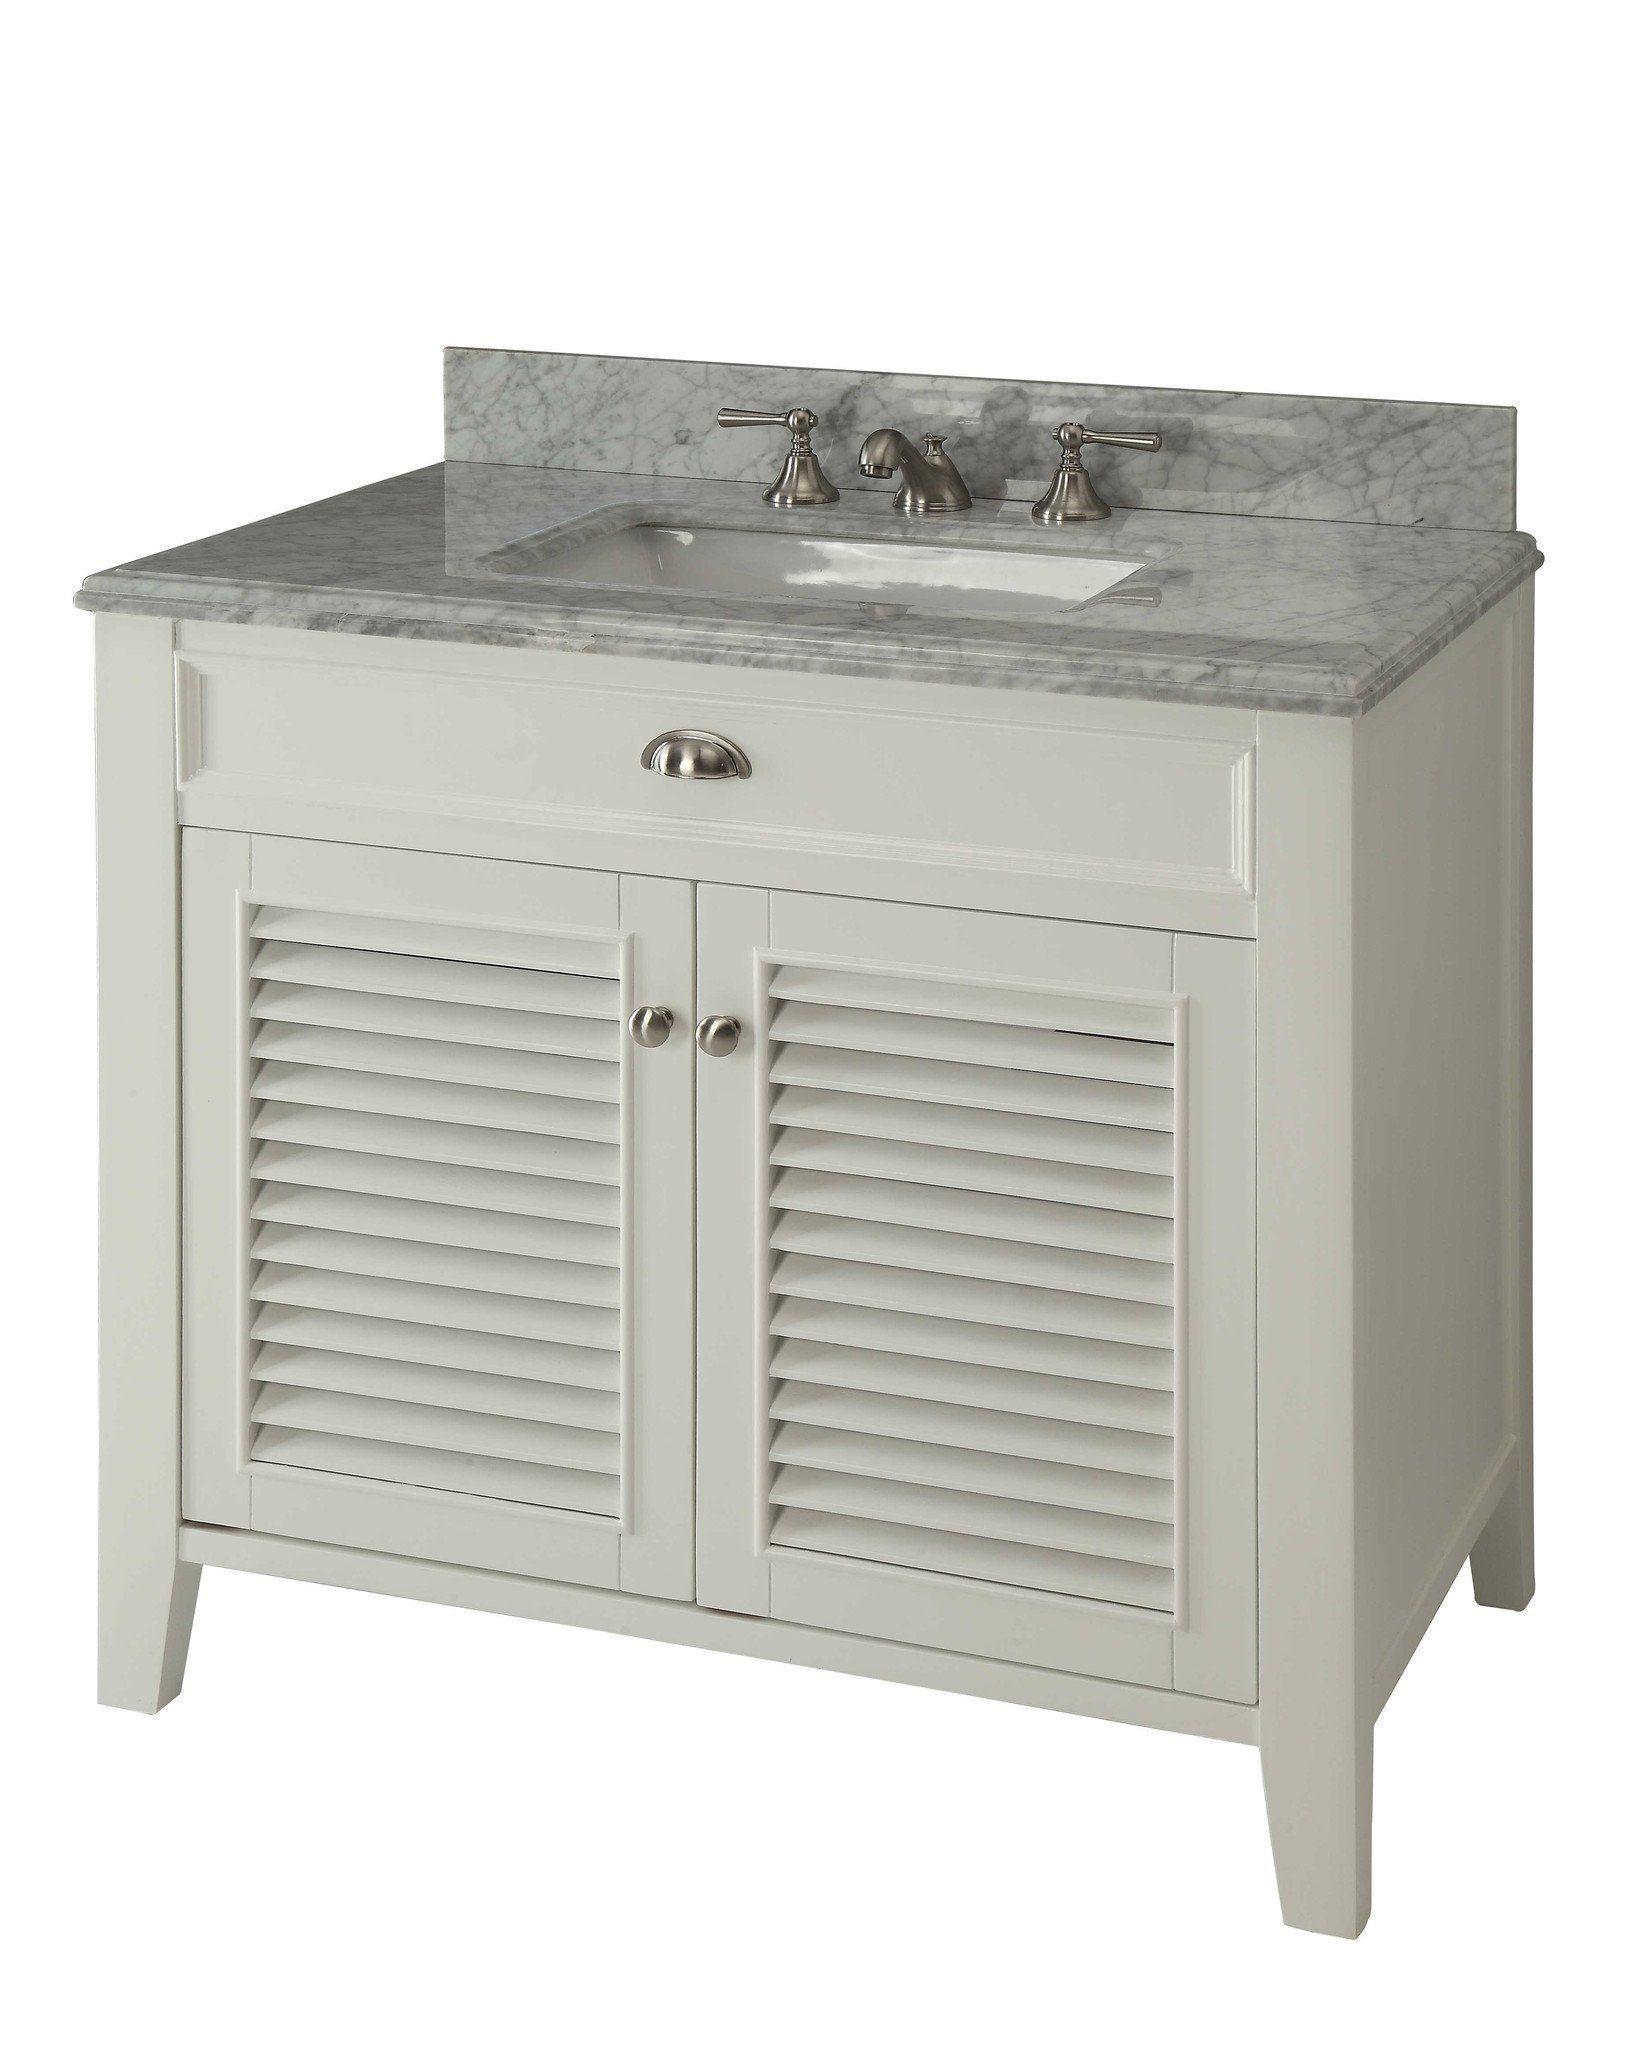 Chans Furniture Yr 3028q 30 Kalani 30 Inch White Bathroom Sink